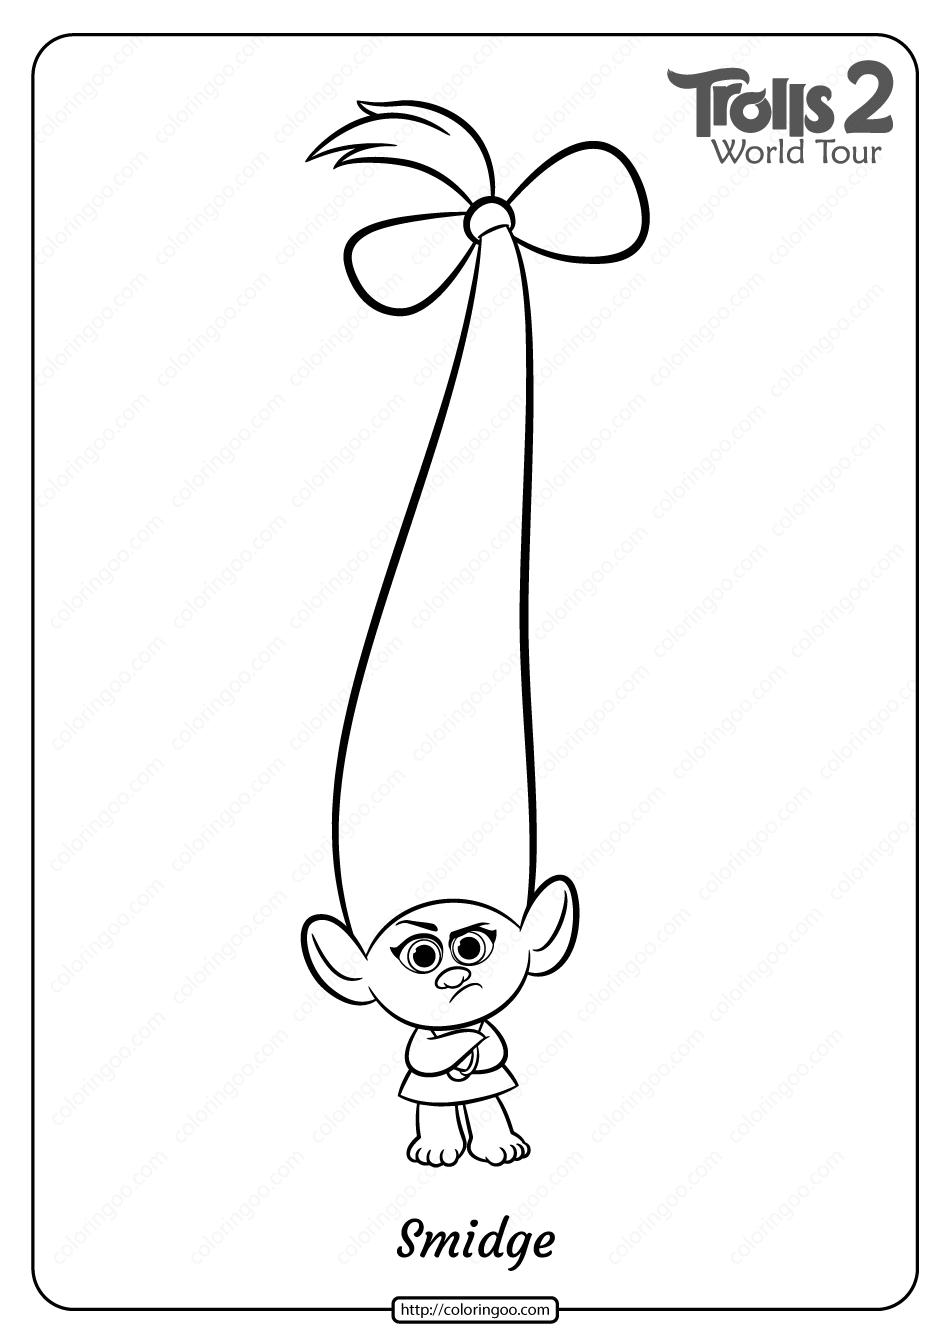 Free Printable Trolls 2 Smidge Pdf Coloring Page Coloring Pages Free Printable Coloring Pages Free Printable Coloring